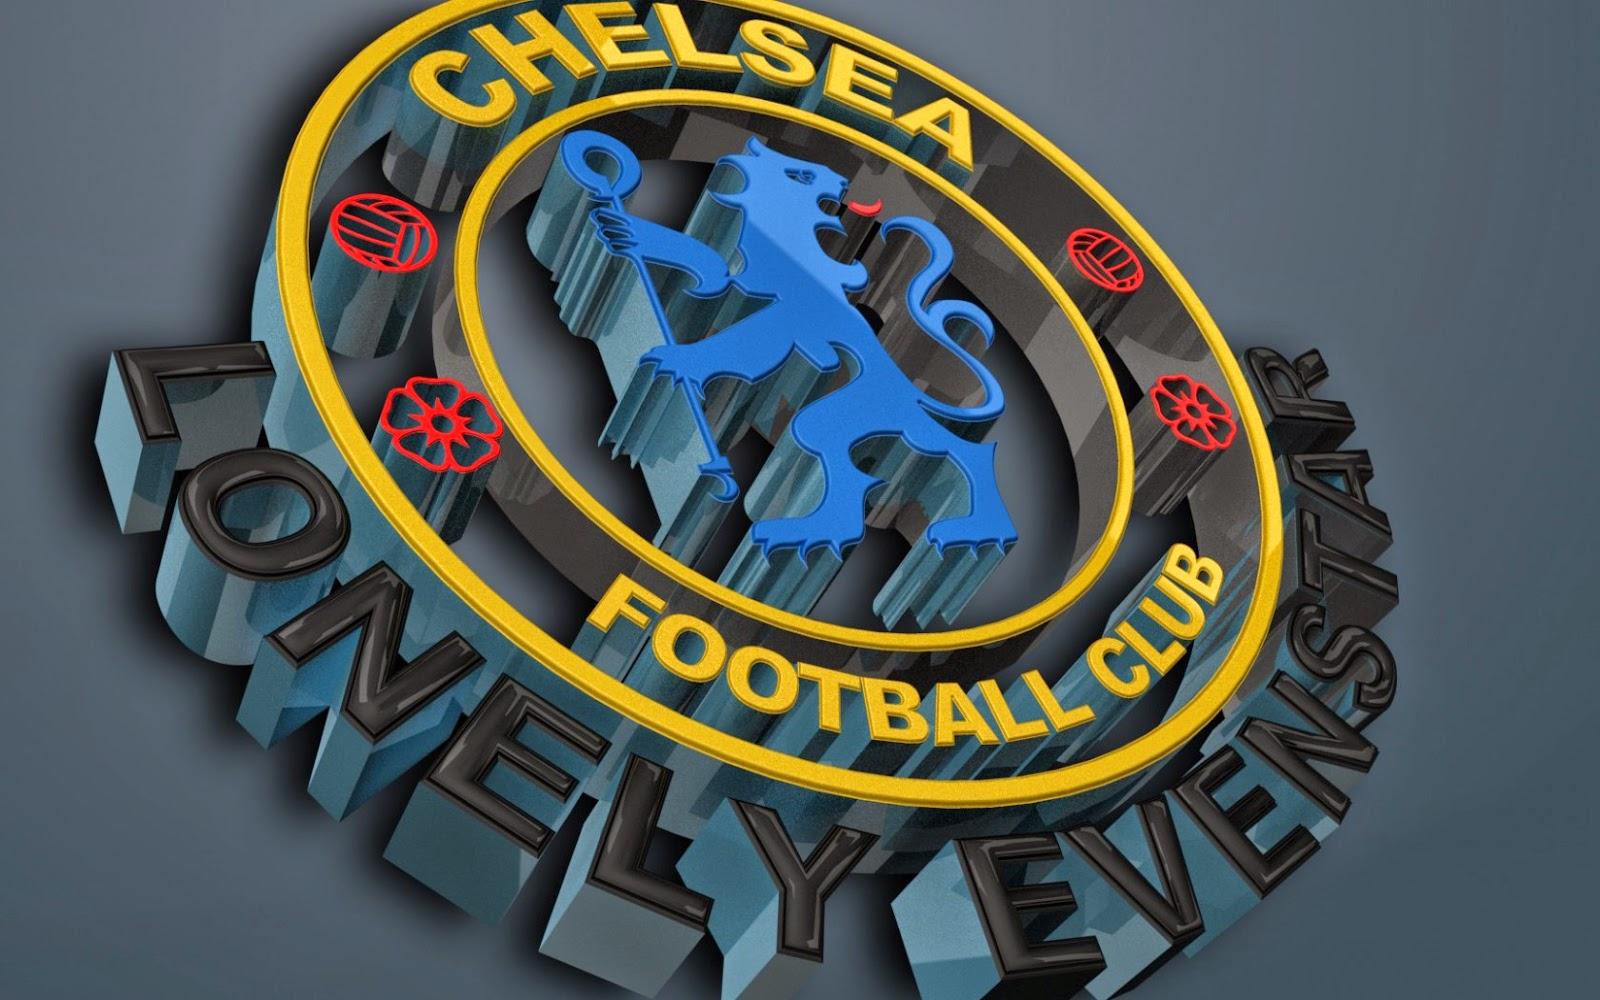 Football Clubs: Chelsea Football Club Wallpaper